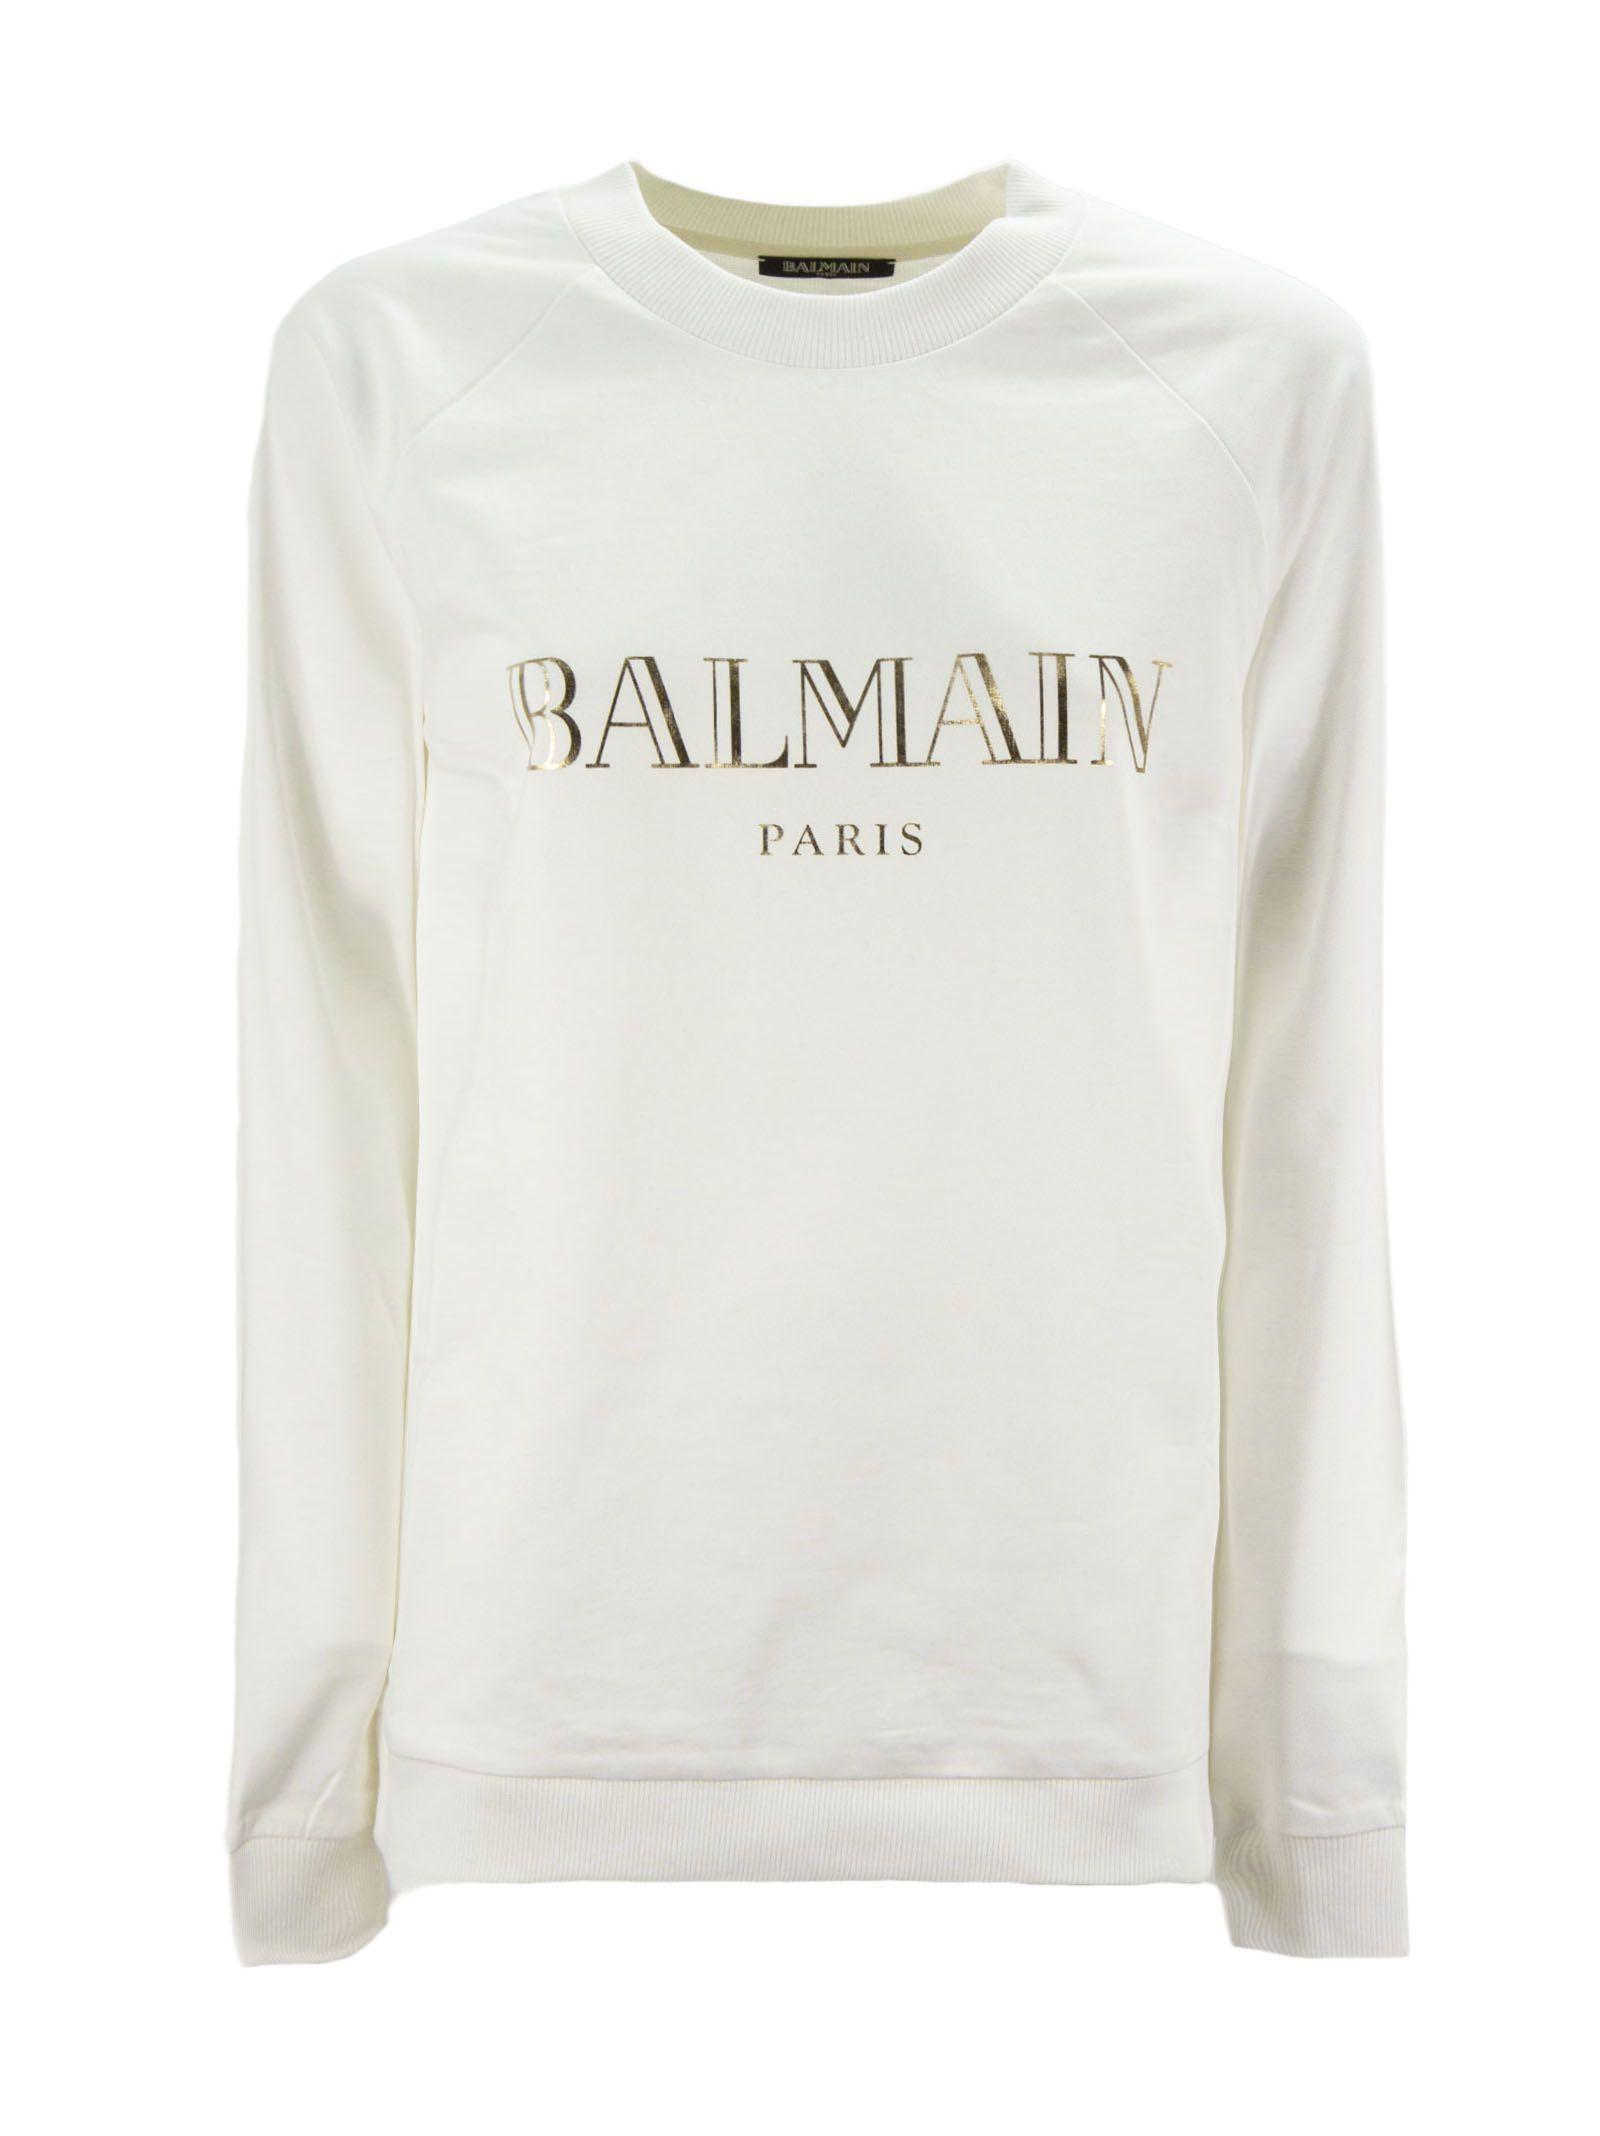 656baf35 Balmain Balmain White And Gold Cotton Sweatshirt - Bianco - 10832079 ...